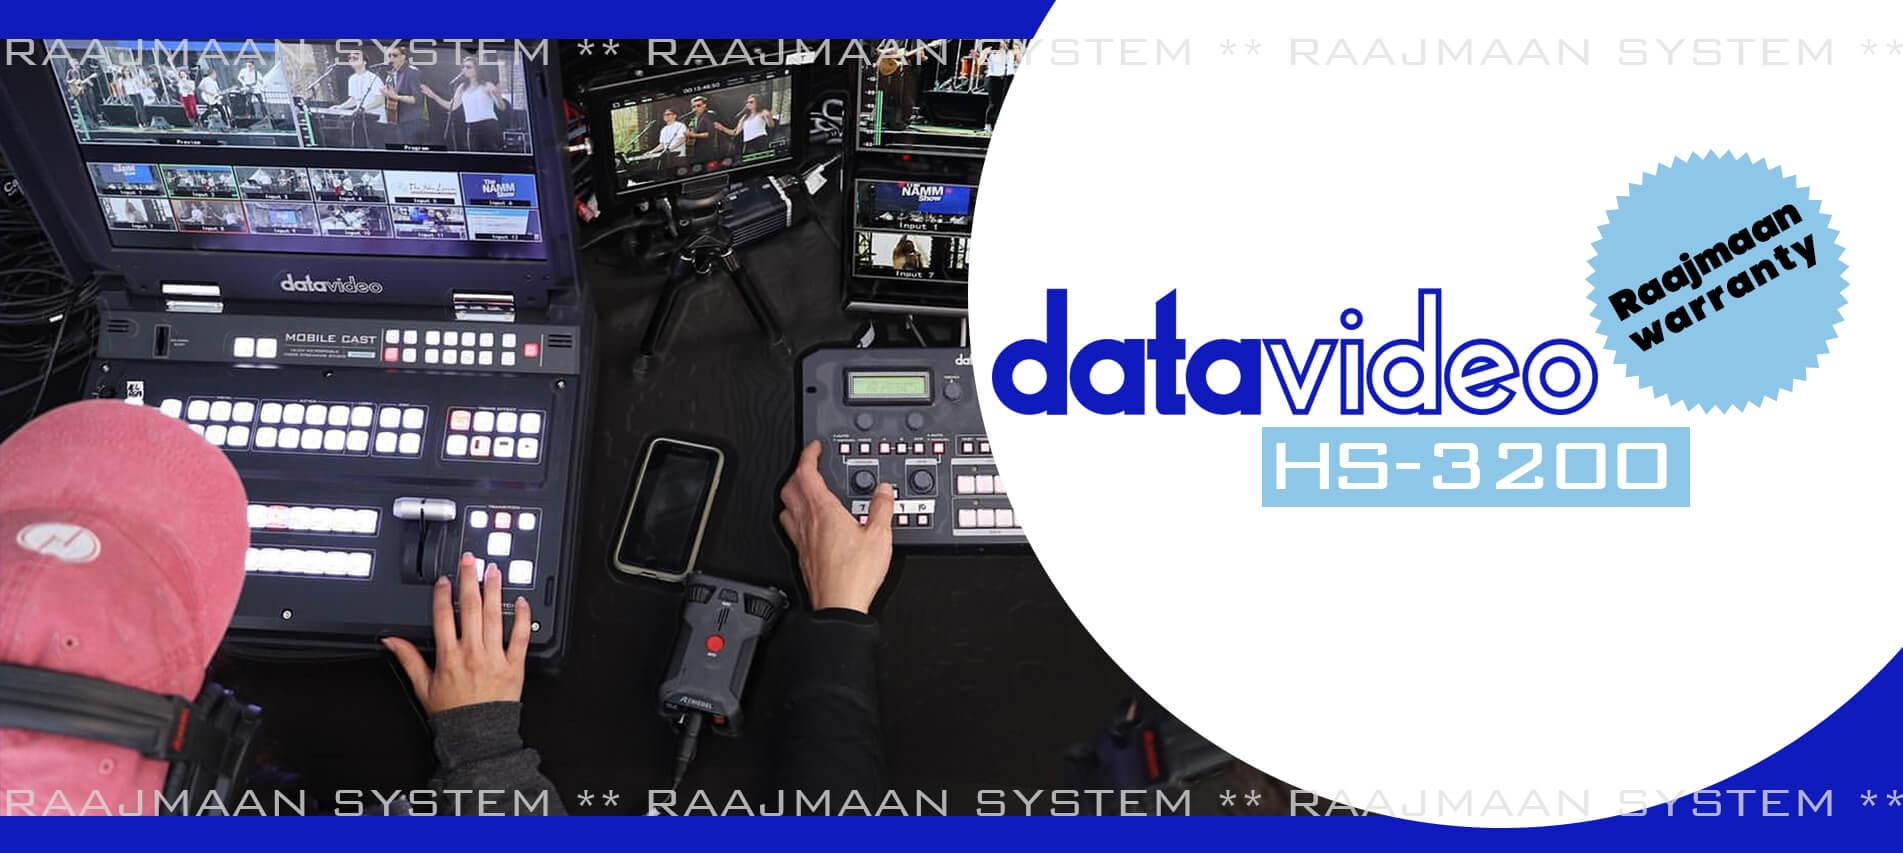 Datavideo HS-3200 raajmaan